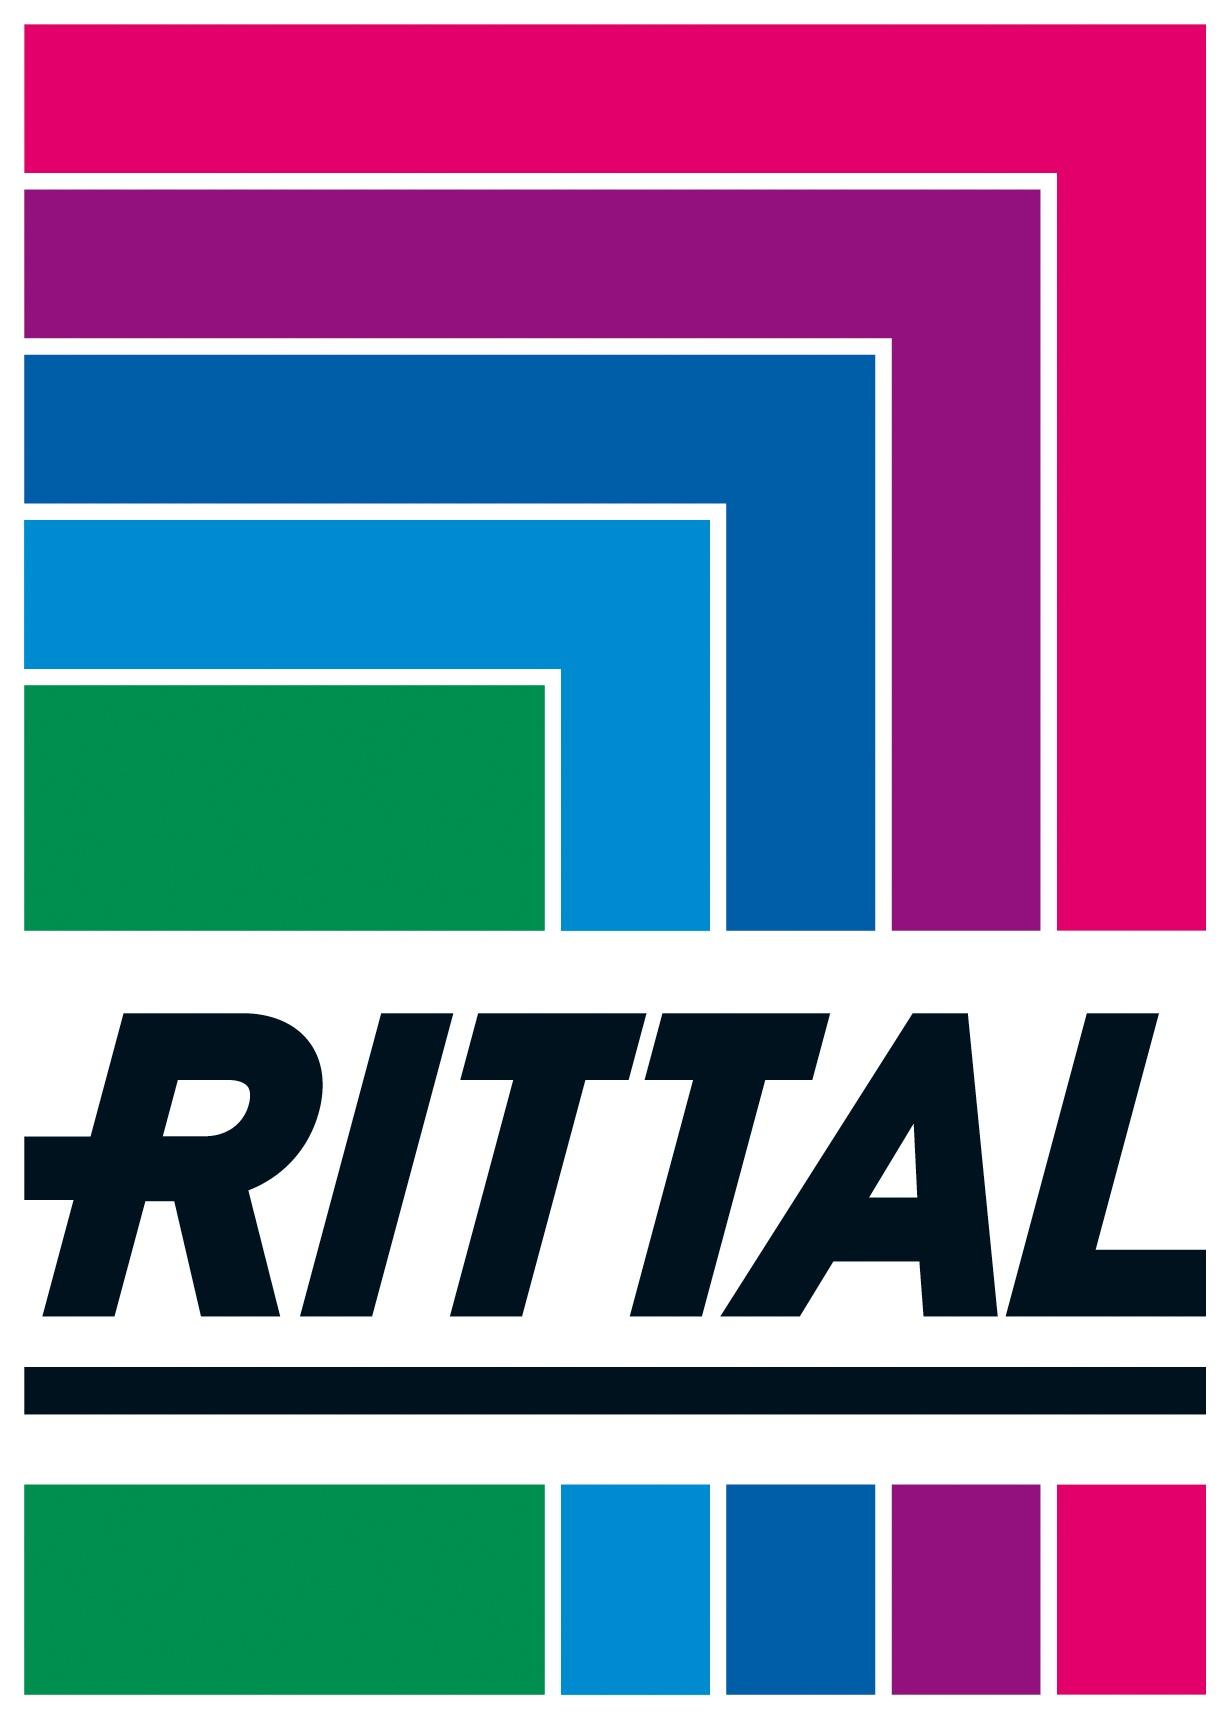 Logo_RITTAL_4c_CS2